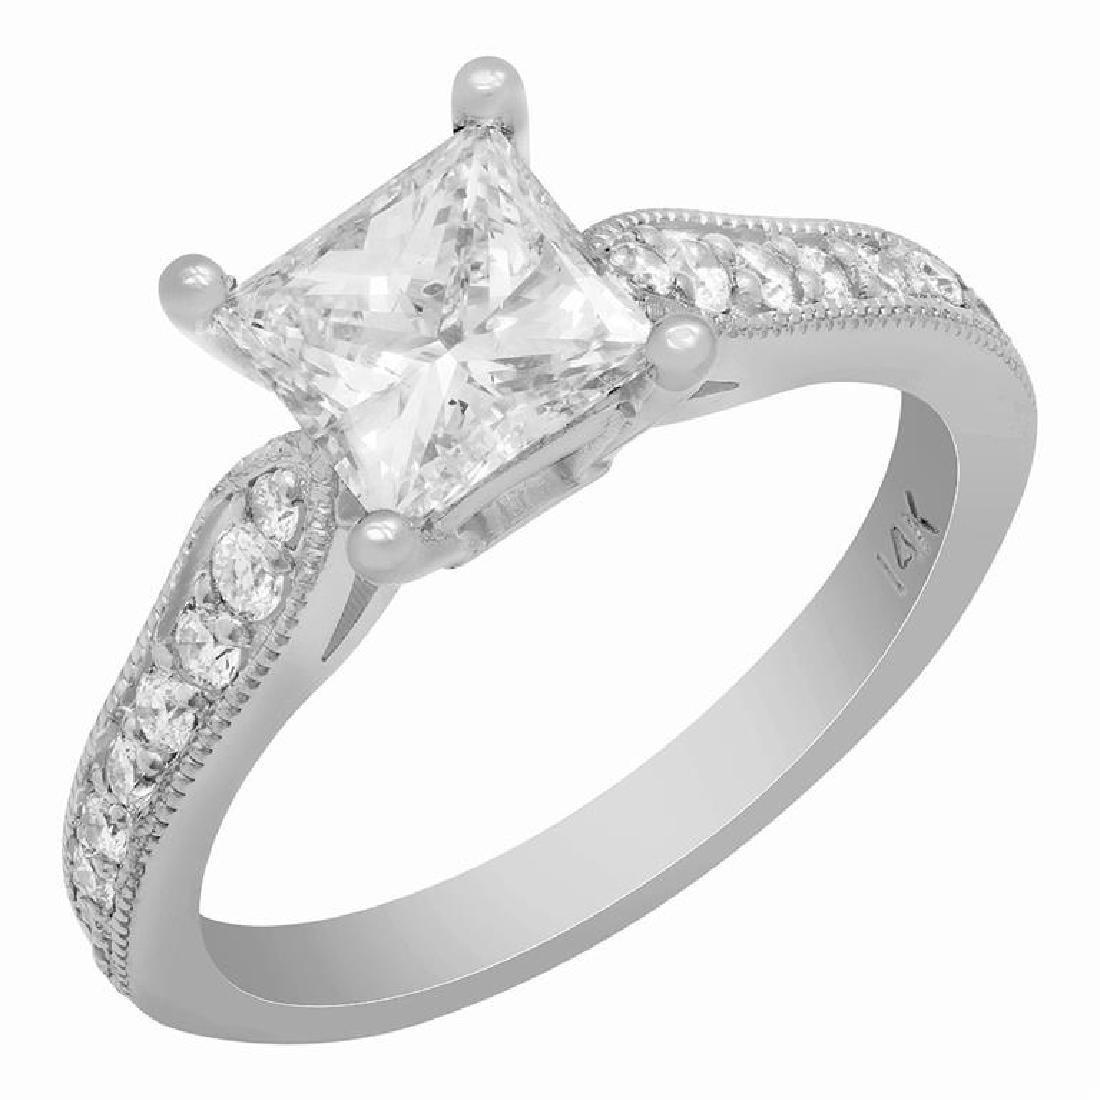 14k White Gold 1.27ct & 0.32ct Diamond Ring